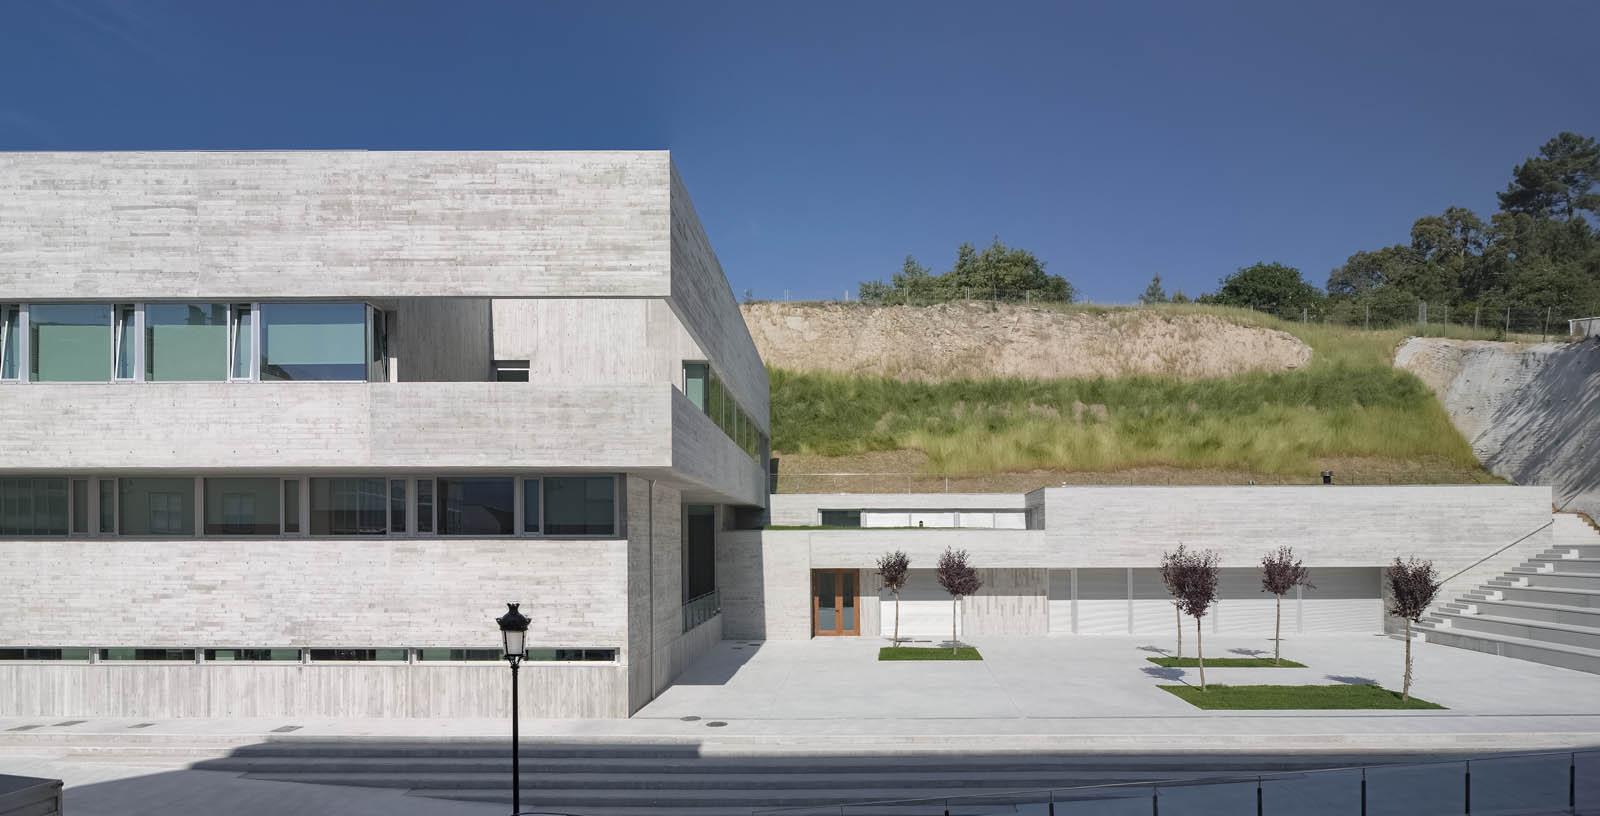 Valenza__Health_Center_004_Architecture_IDOM_Copyright_Aitor_Ortiz